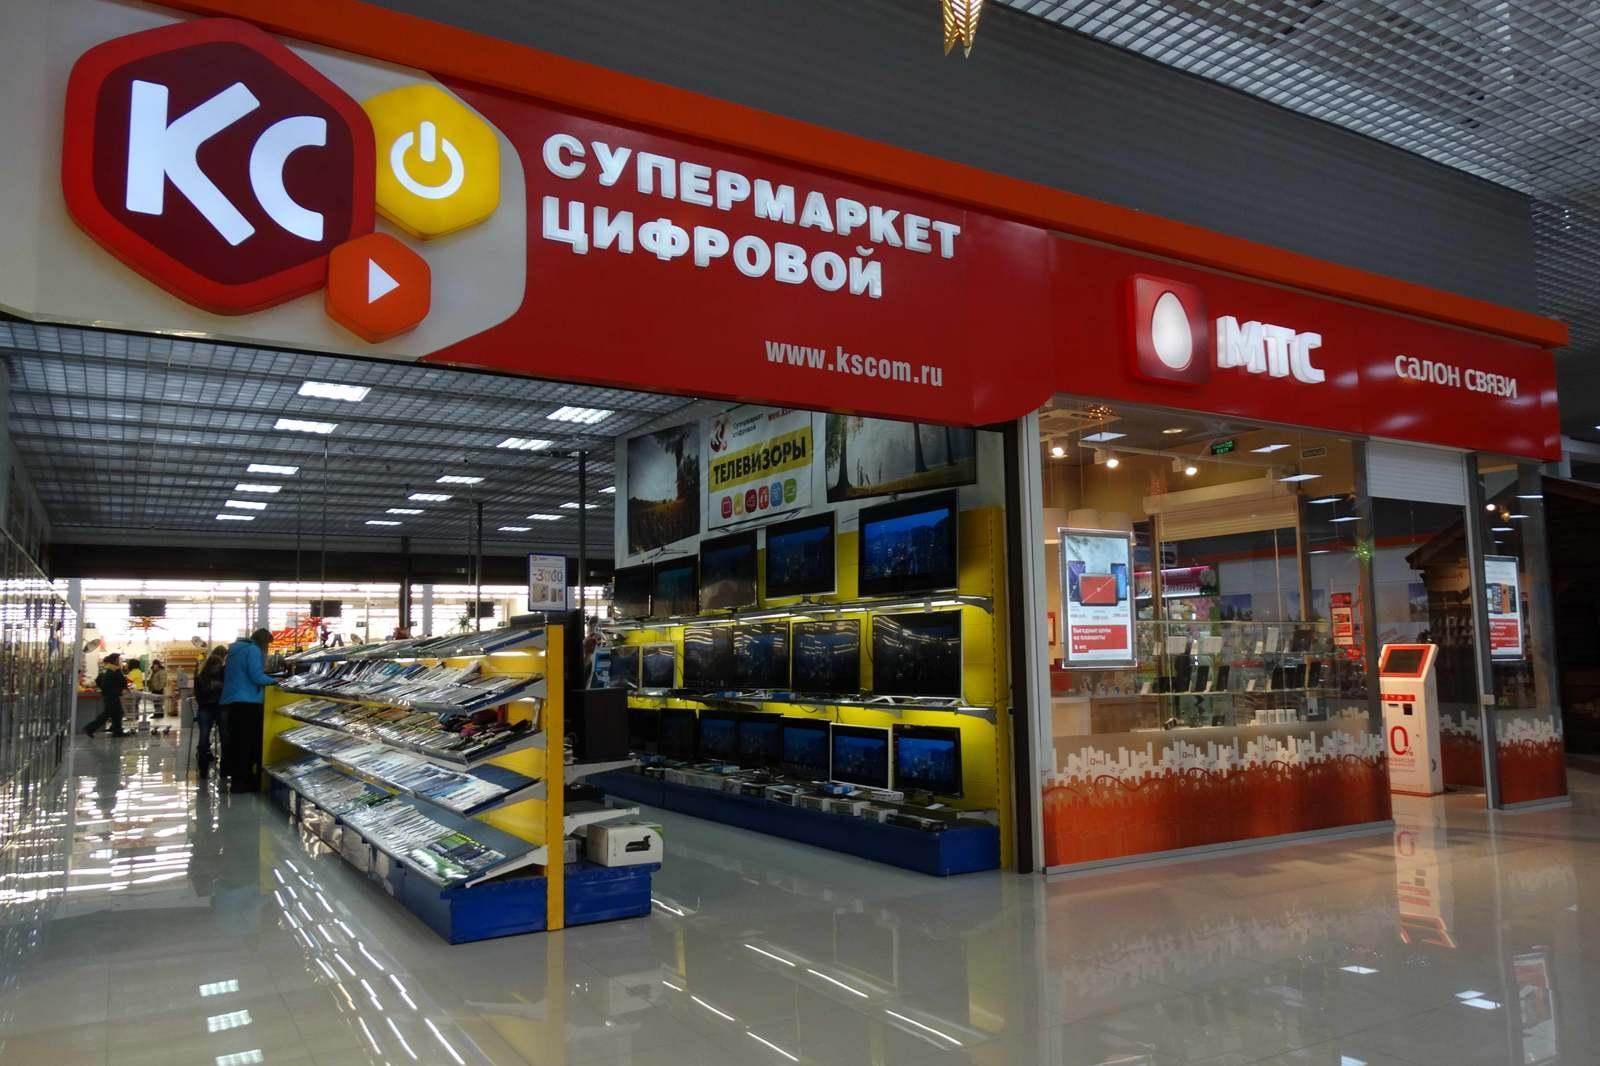 В каком районе находится ул.гайдара в прокопьевске